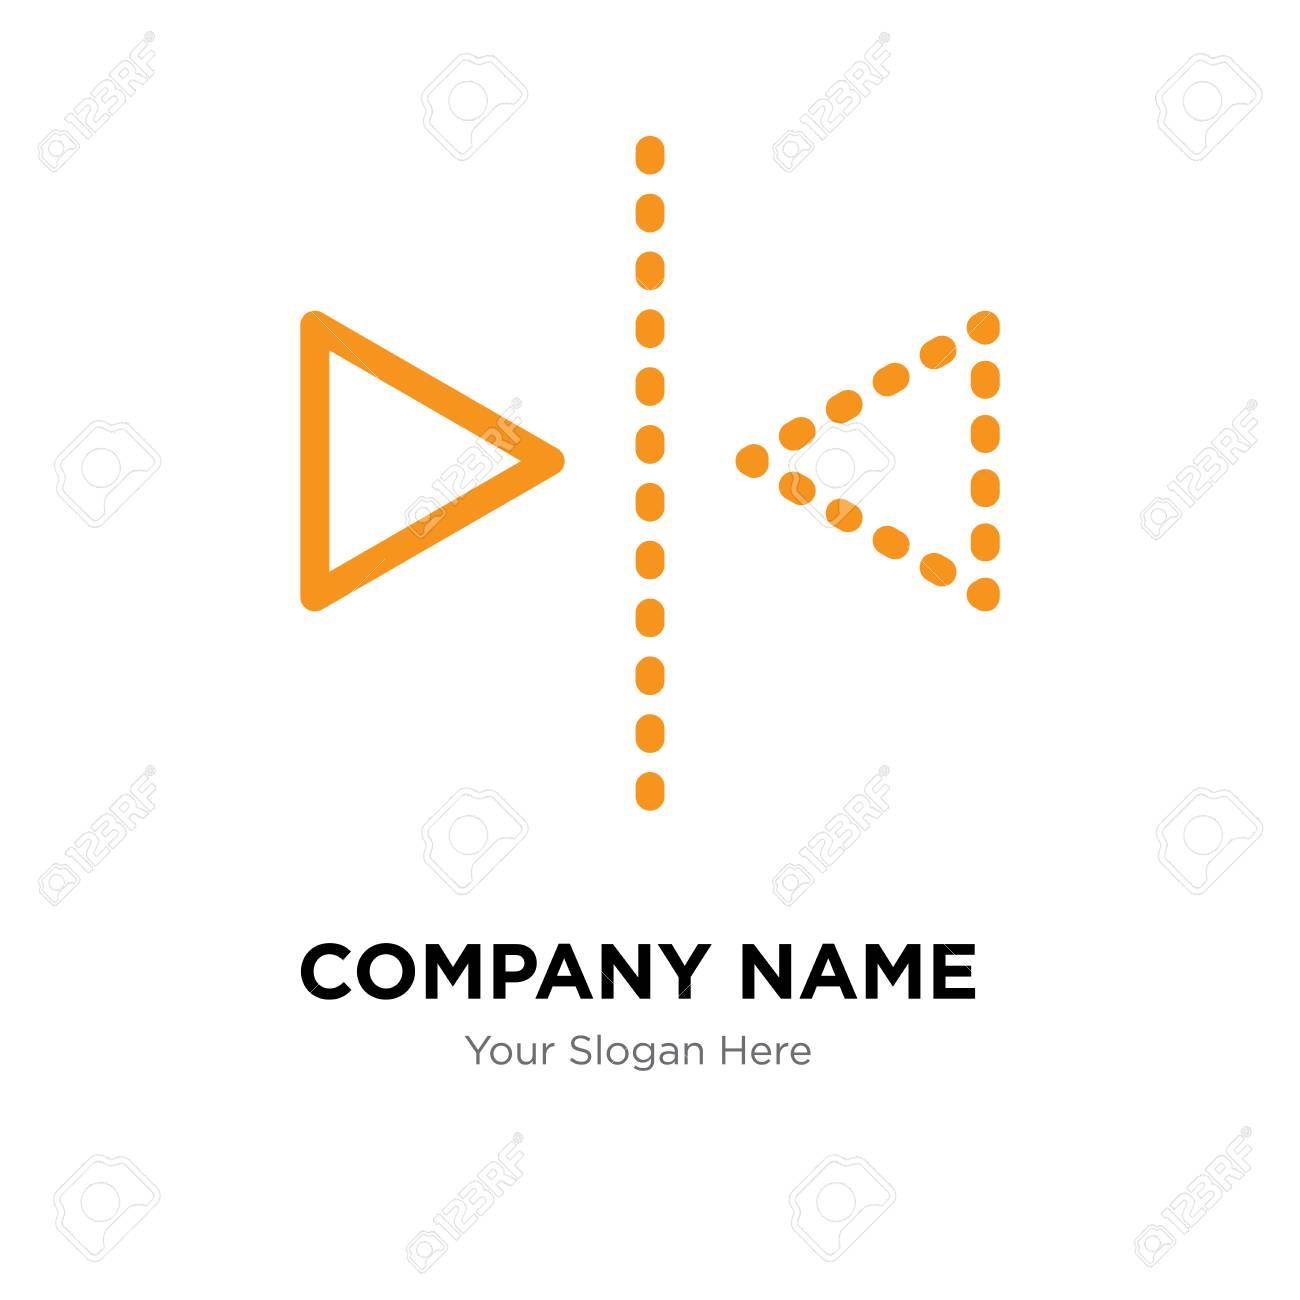 Reflection company logo design template, Reflection logotype vector icon, business corporative - 106295614